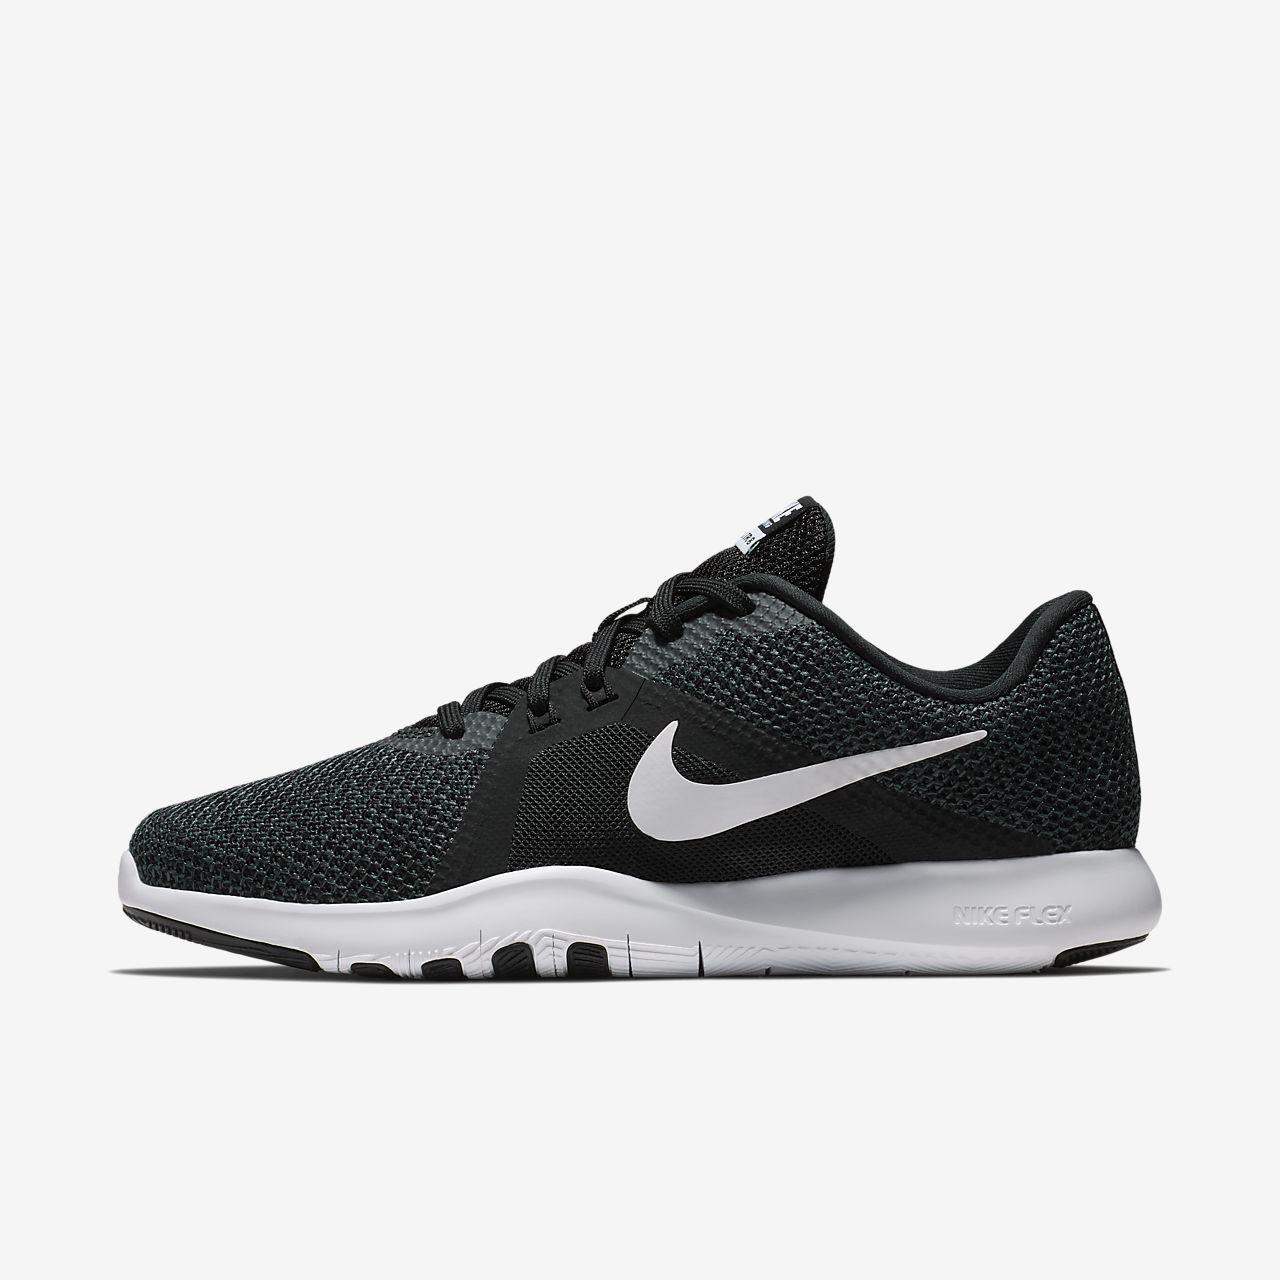 mens jordan workout shoes nz